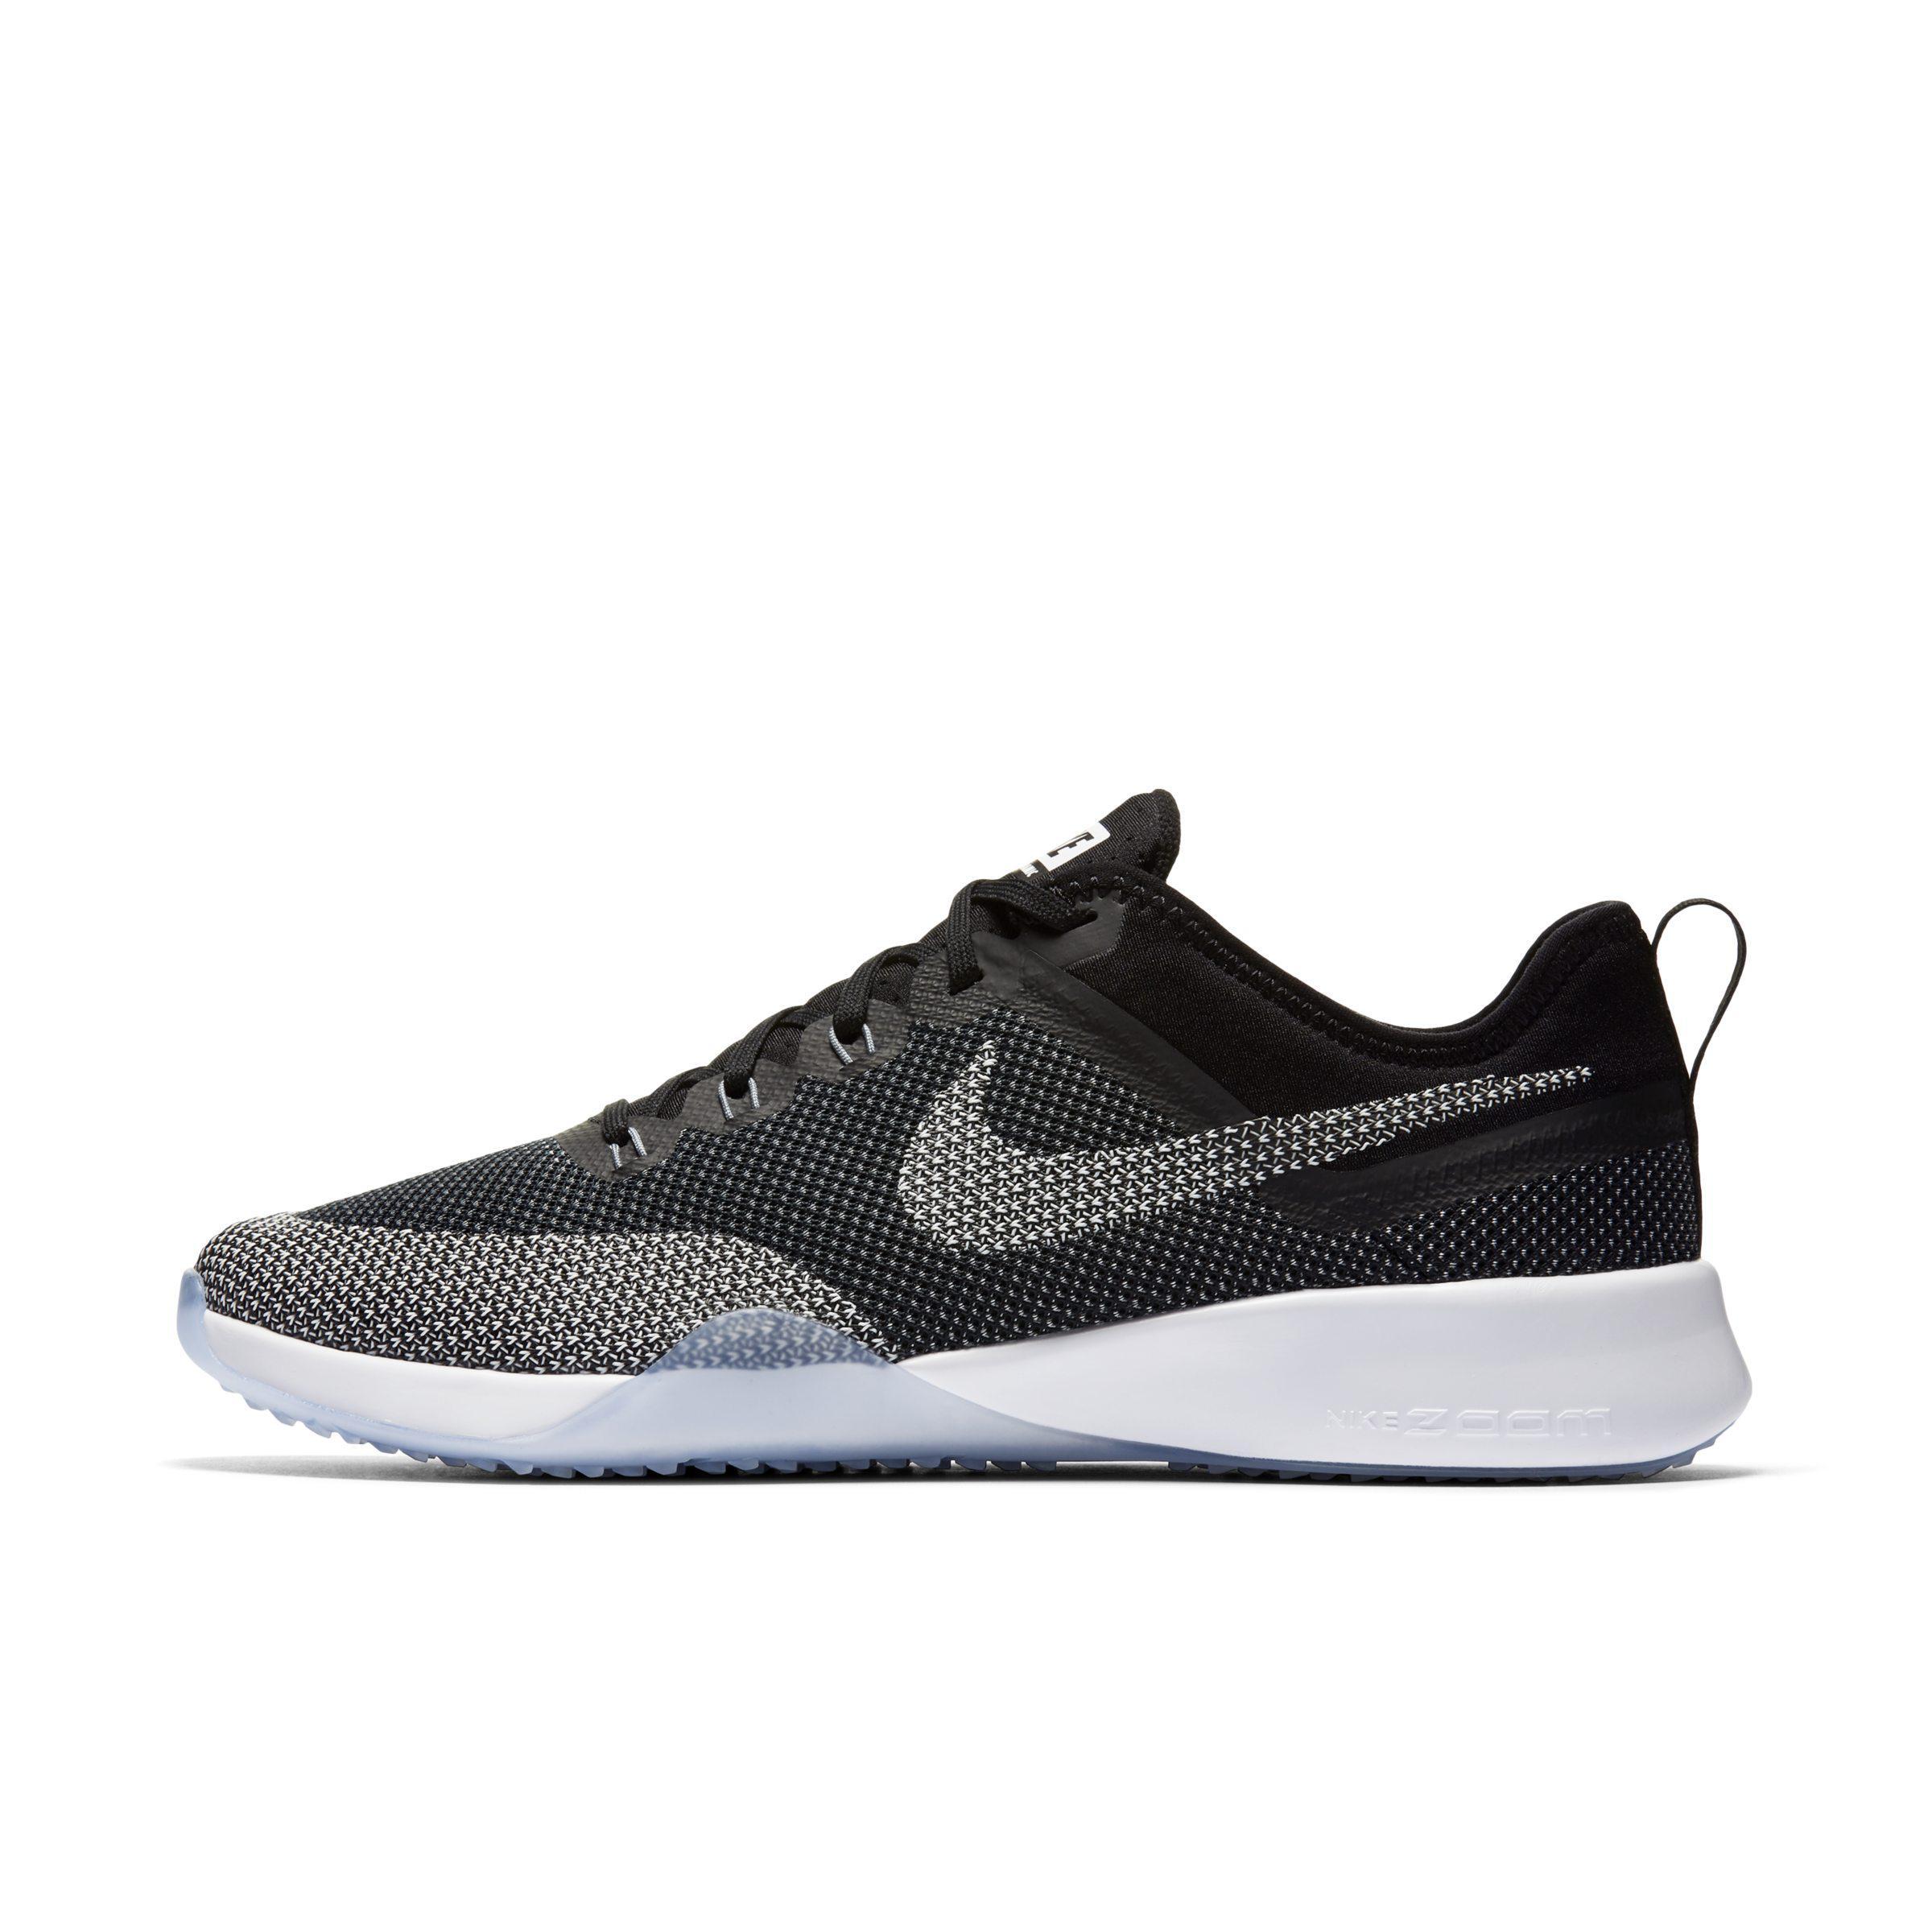 a79051996238 Nike Air Zoom Dynamic Tr Training Shoe in Black - Lyst